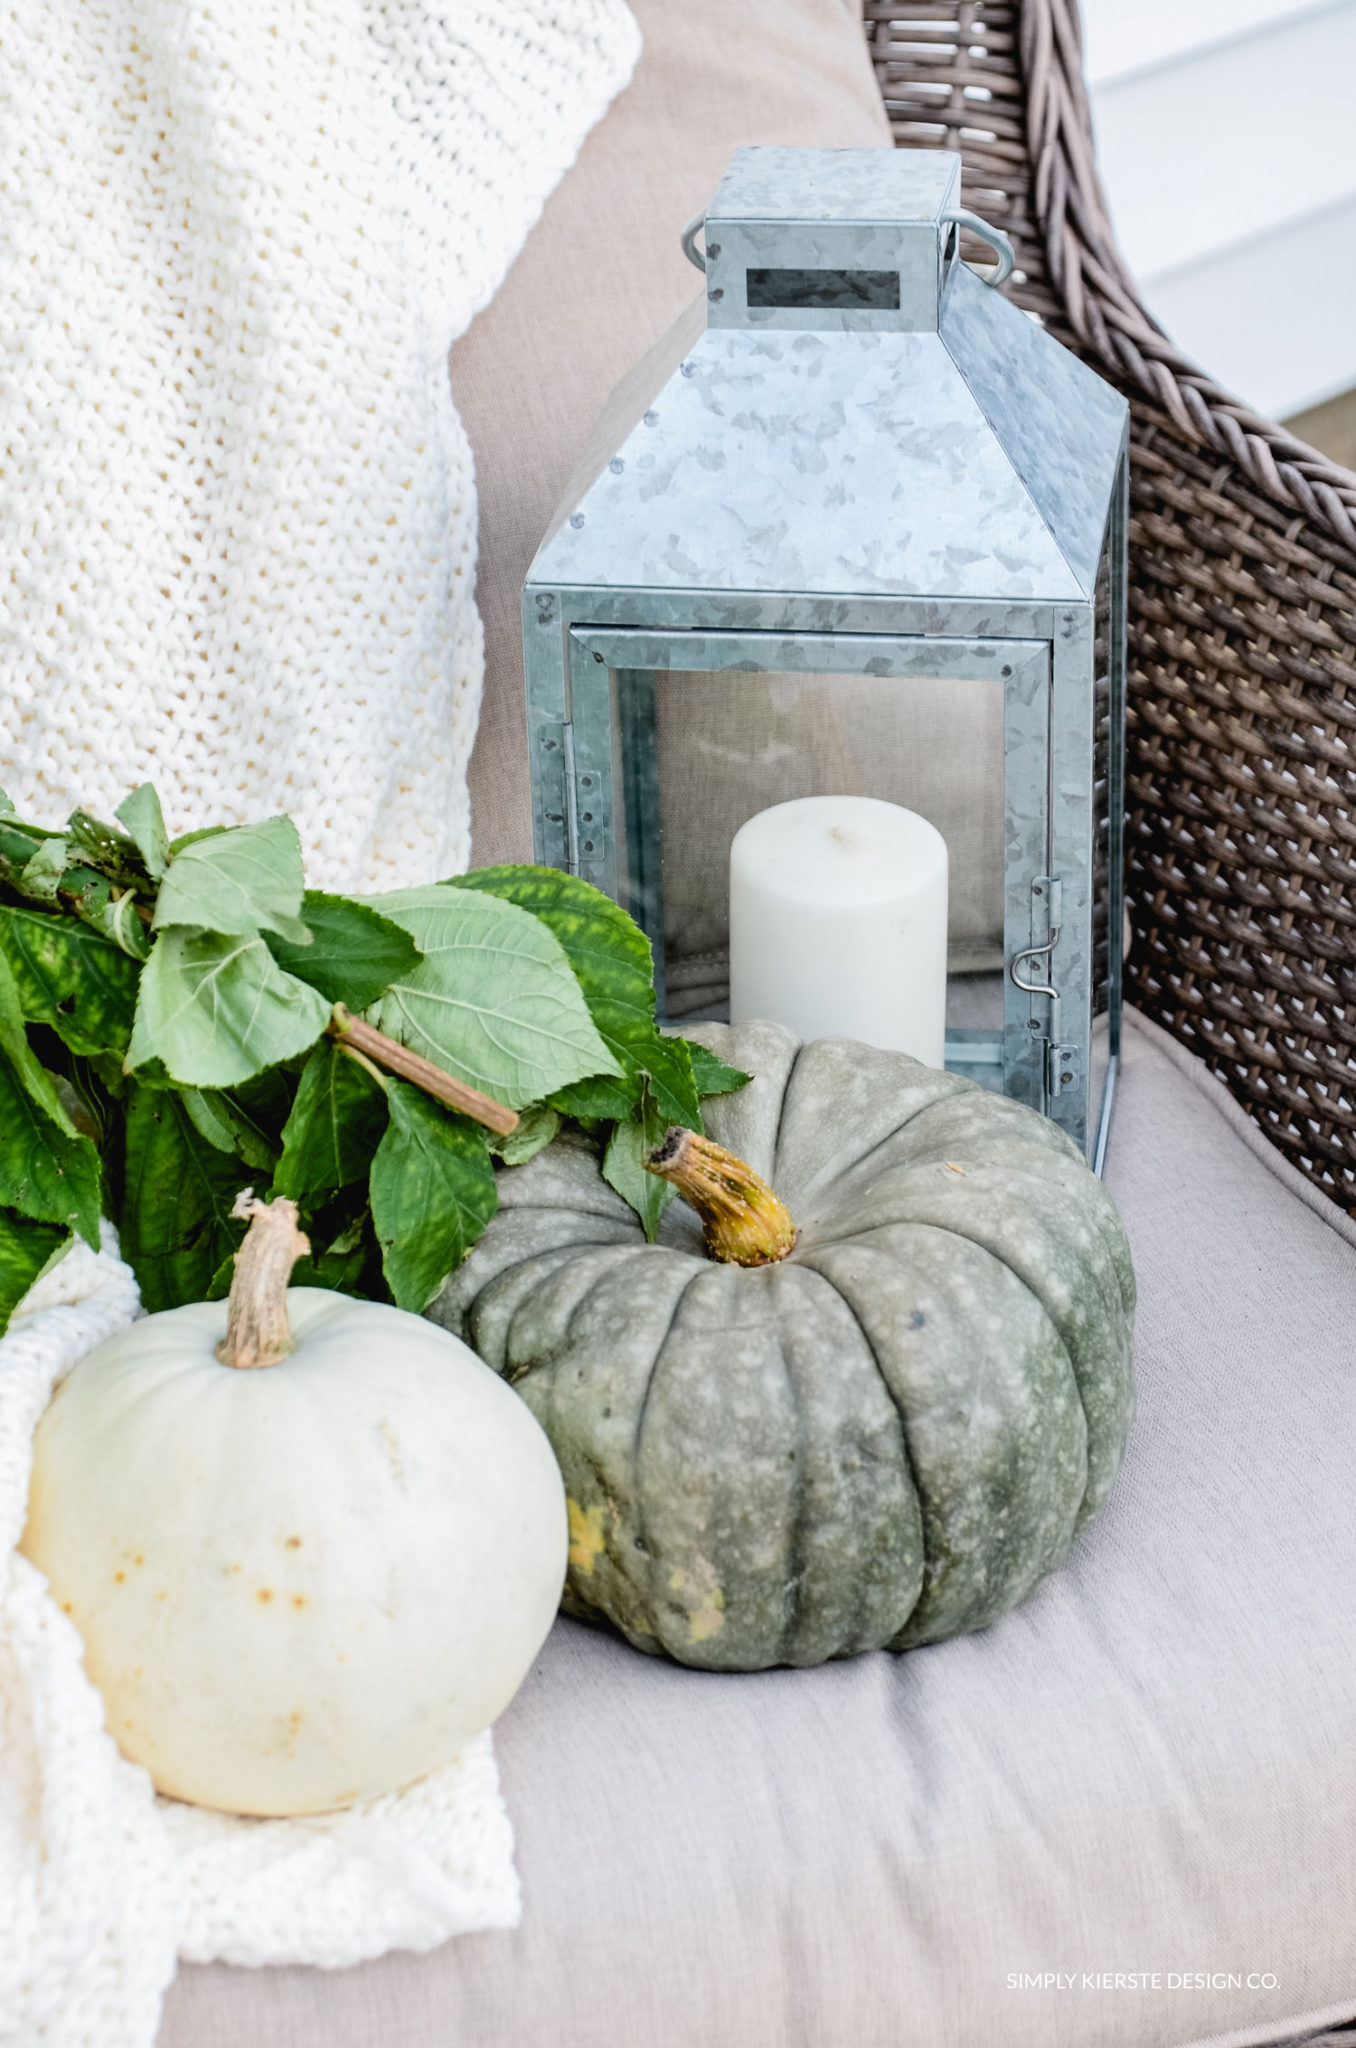 Simple Fall Porch | Better Homes & Gardens | Easy Fall Porch Ideas | oldsaltfarm.com